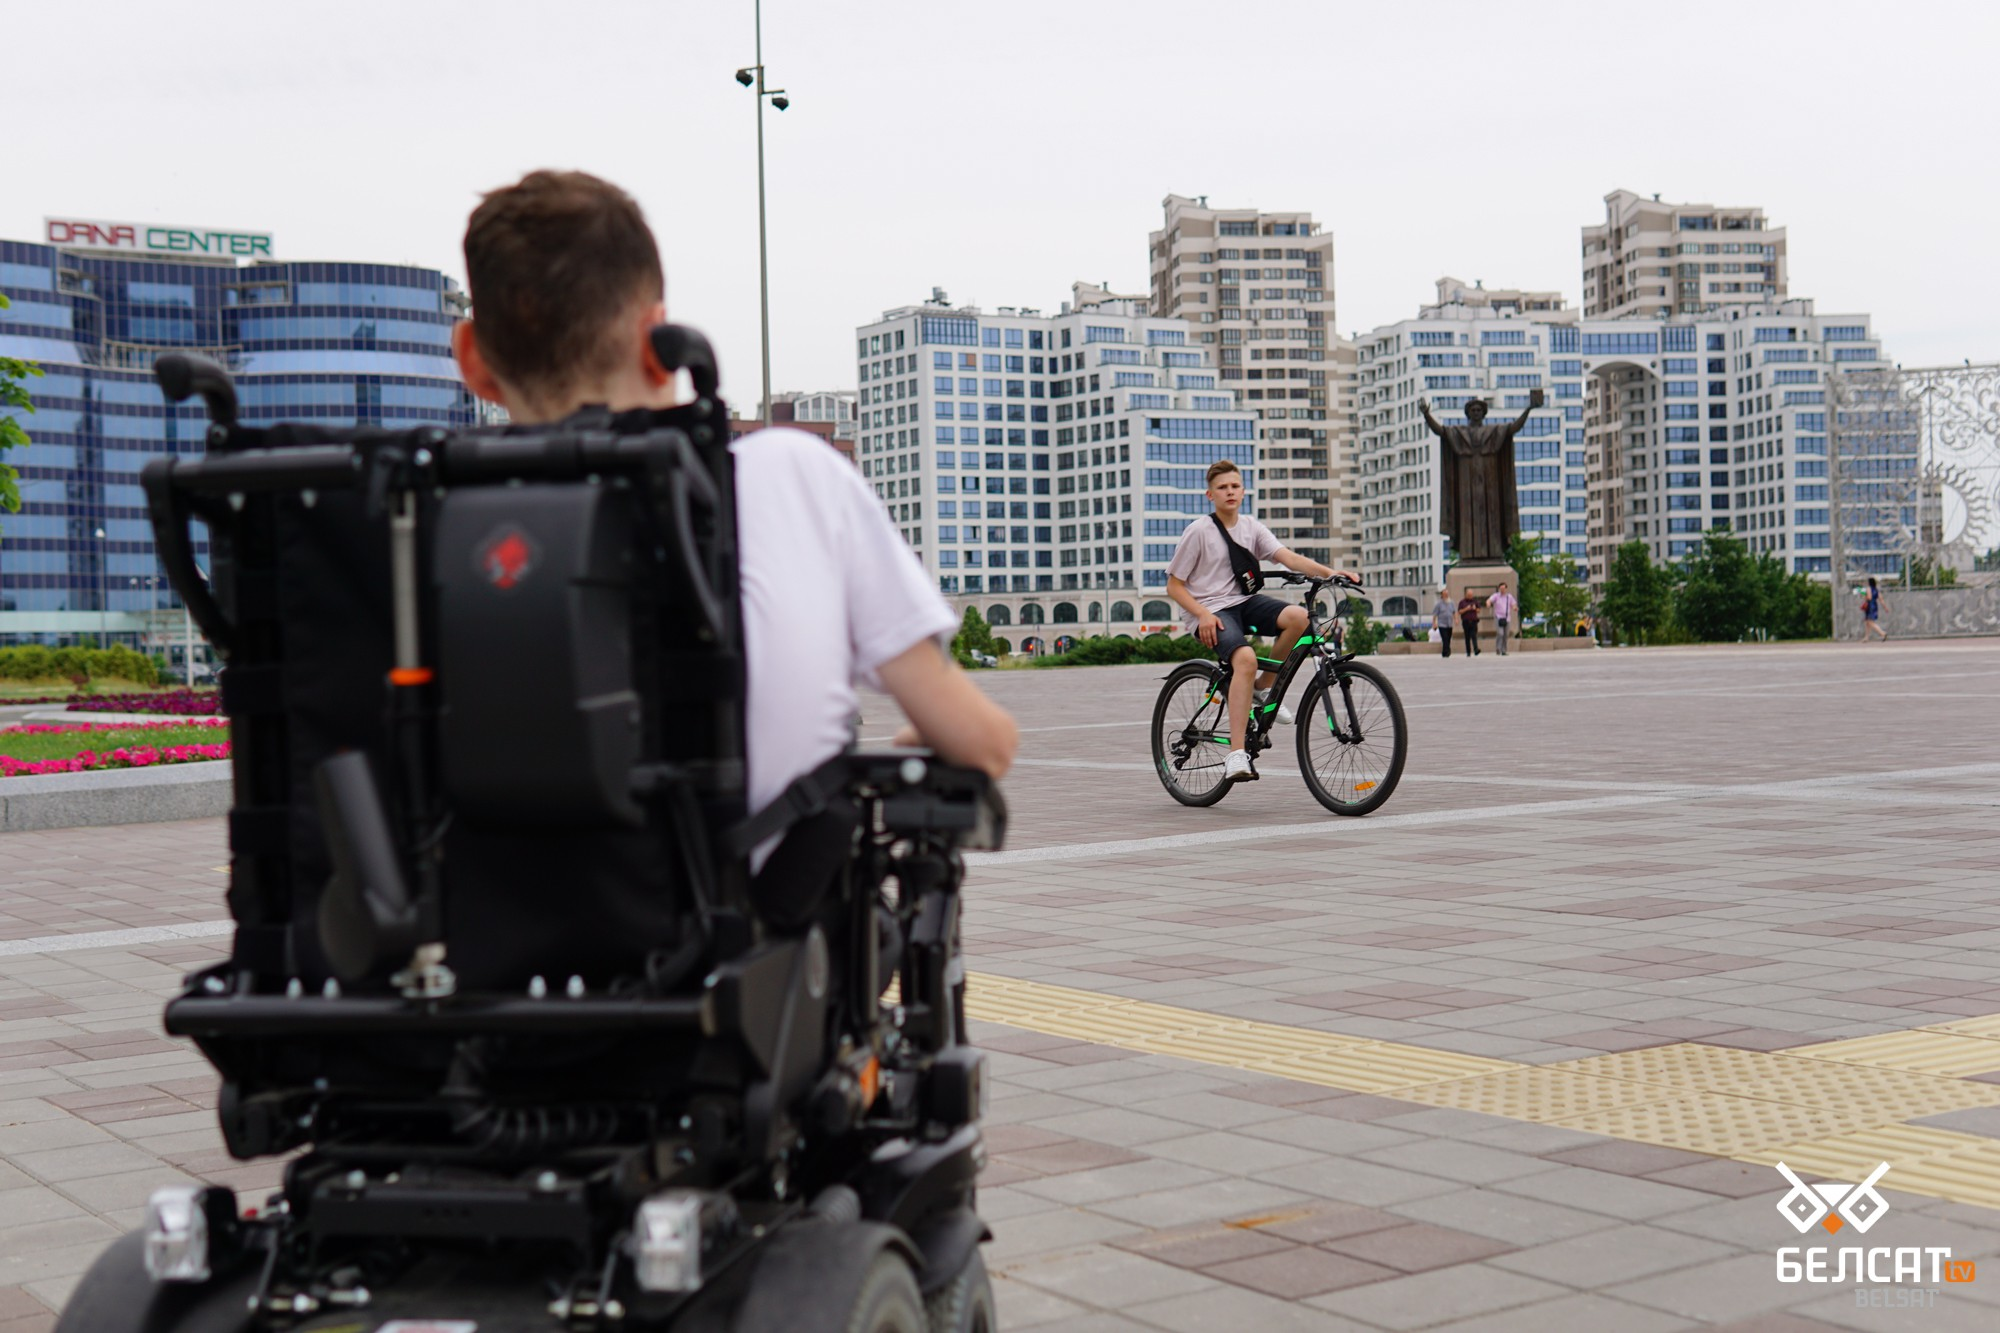 Минск, Беларусь. 24 июня 2021 года. Фото: АК / Белсат